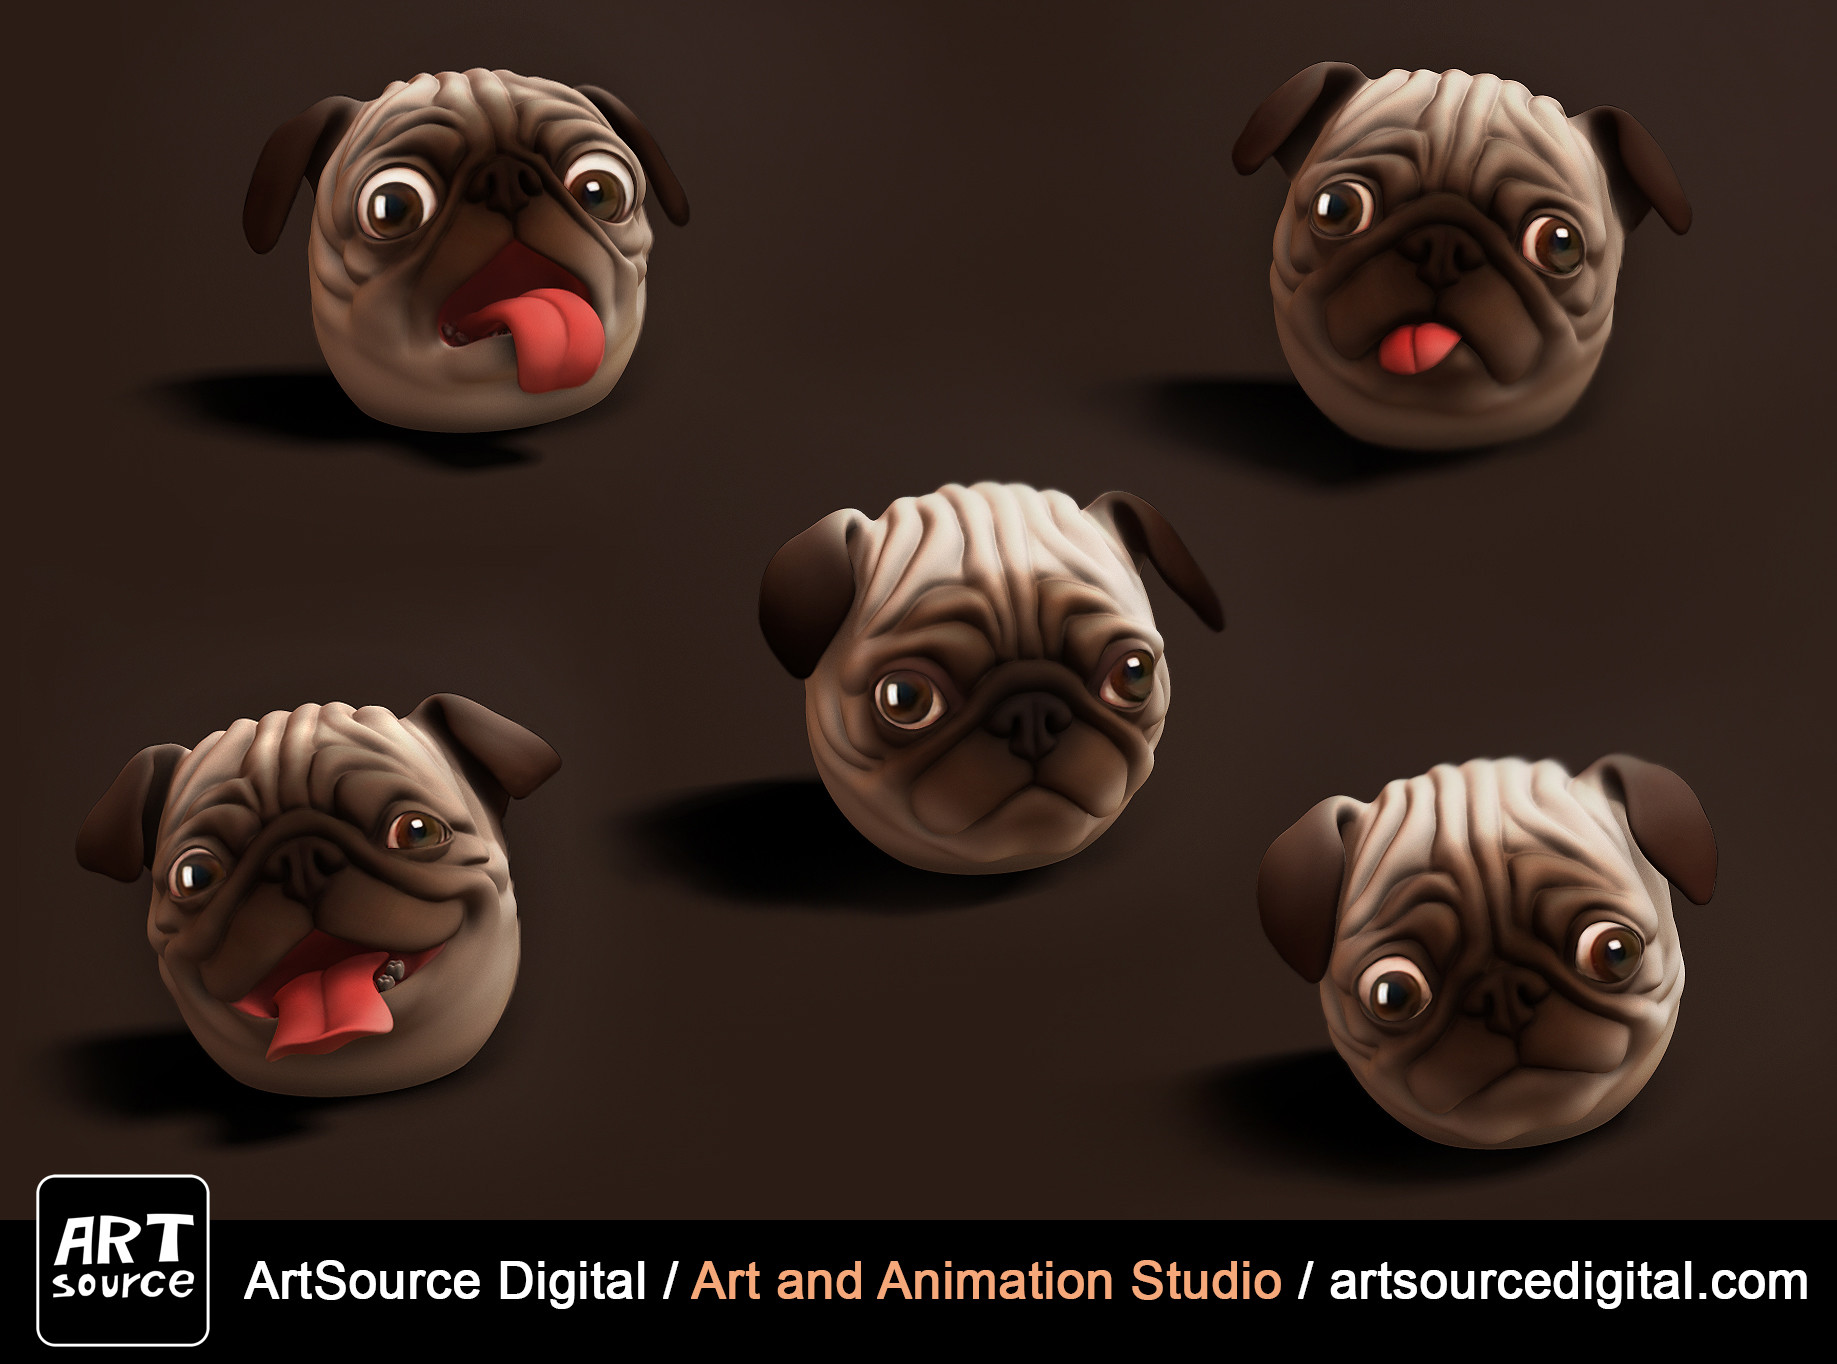 Artsource digital pugs artasset 01 01